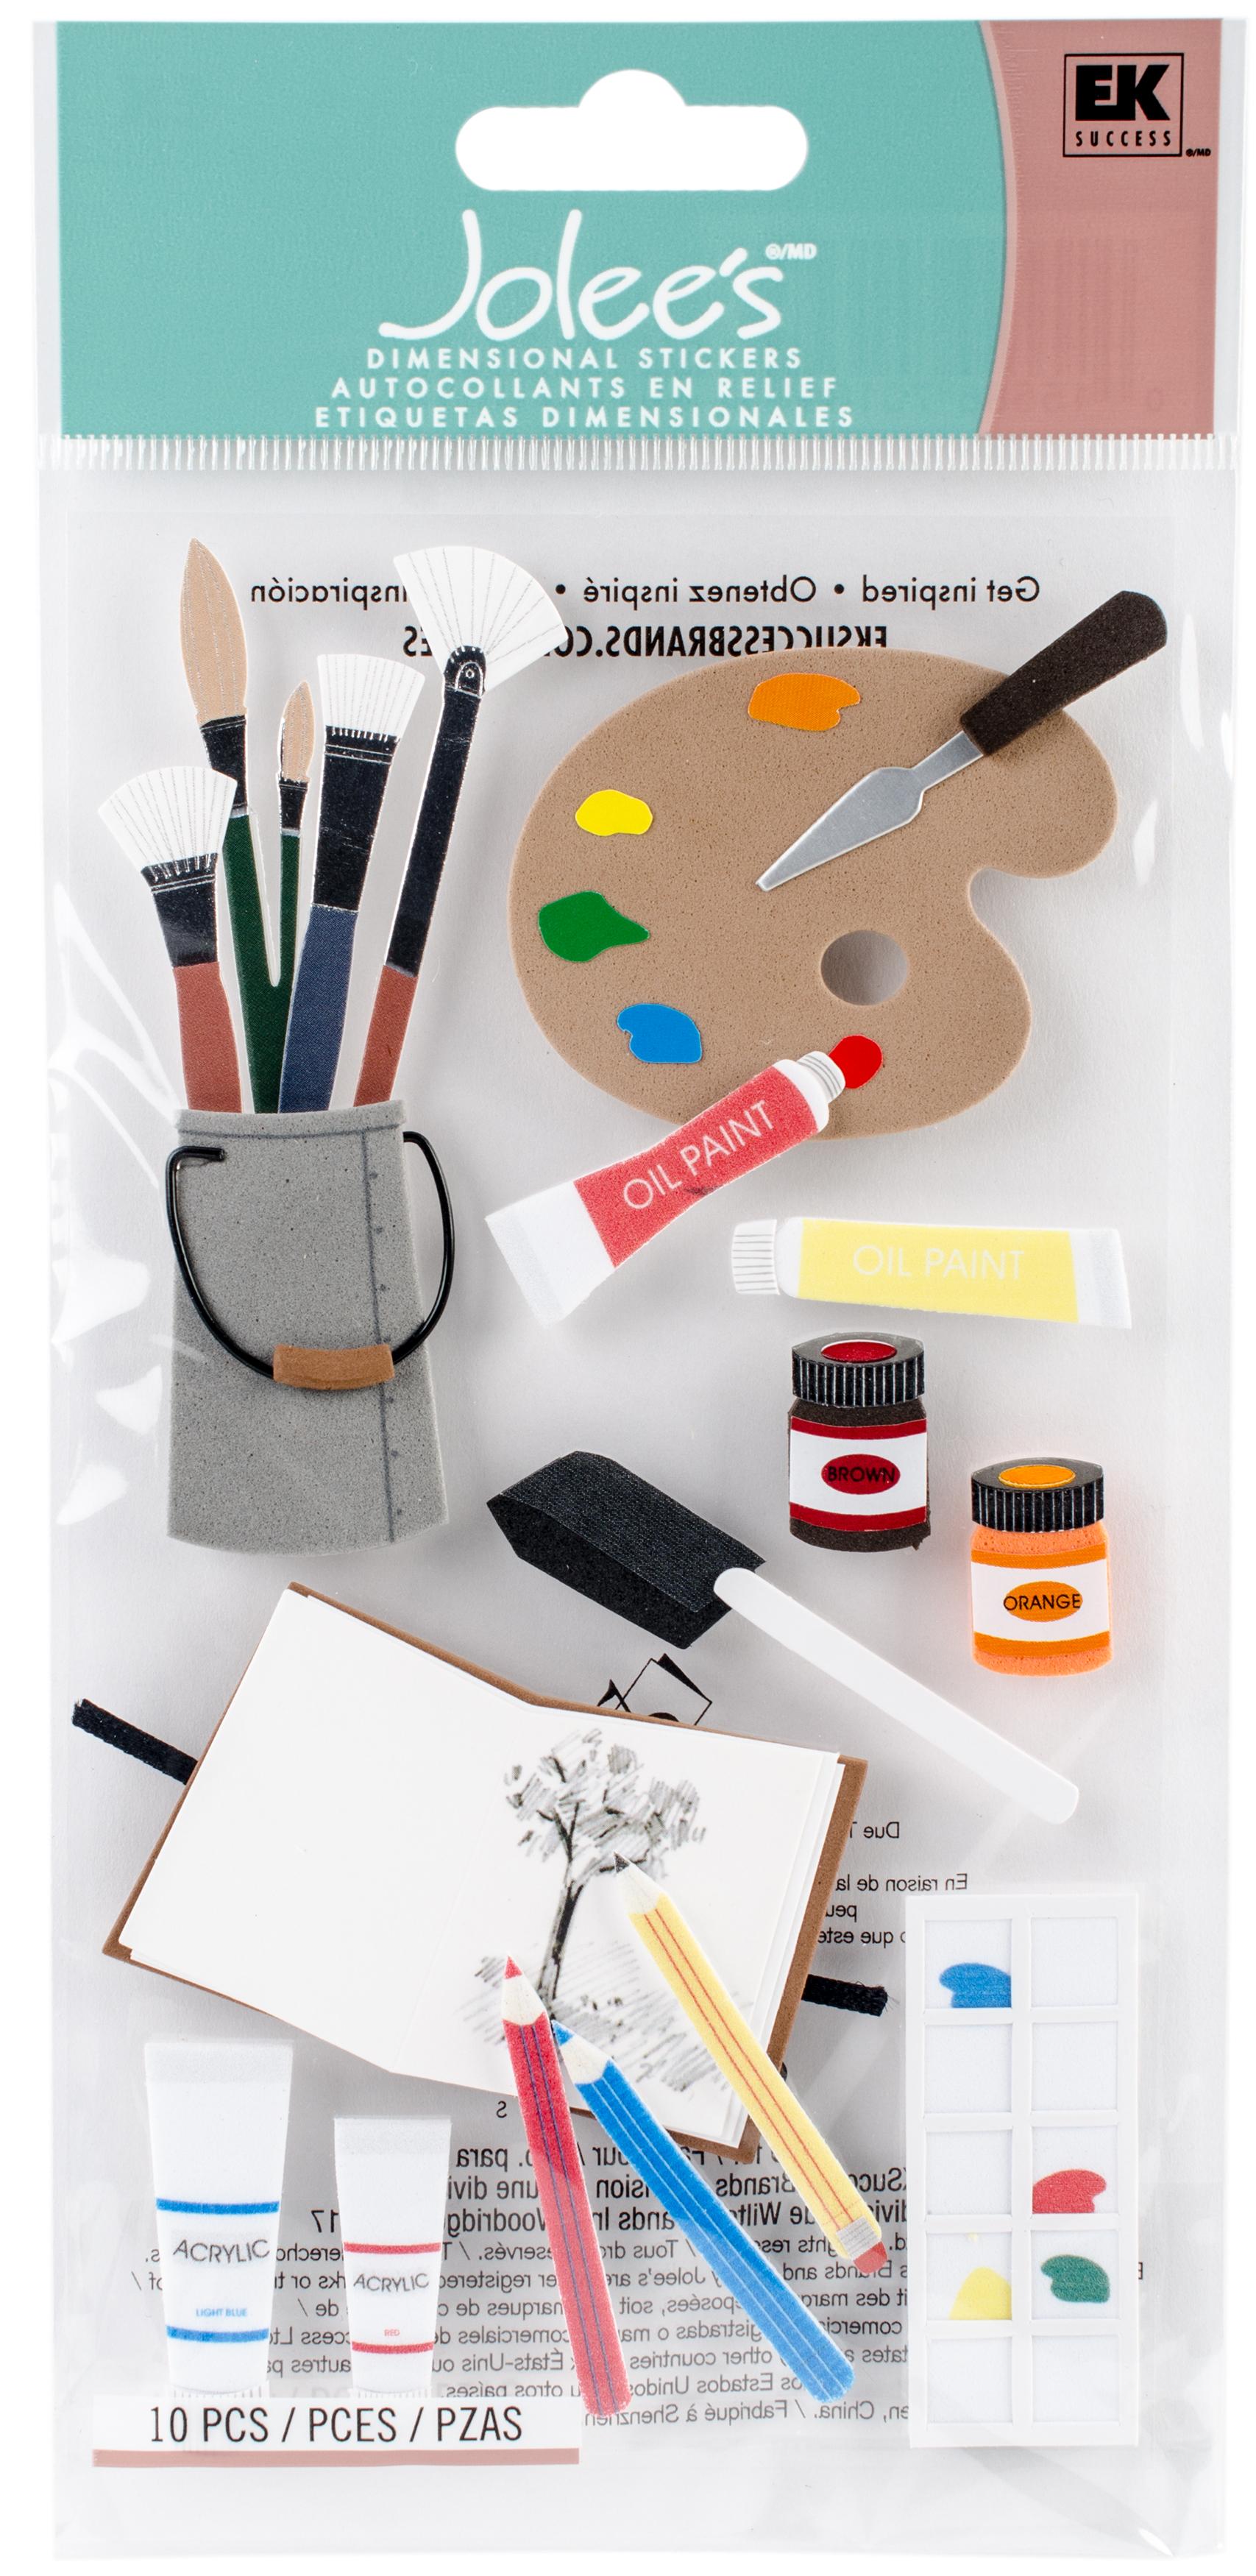 Jolee's Stickers-Art Supplies